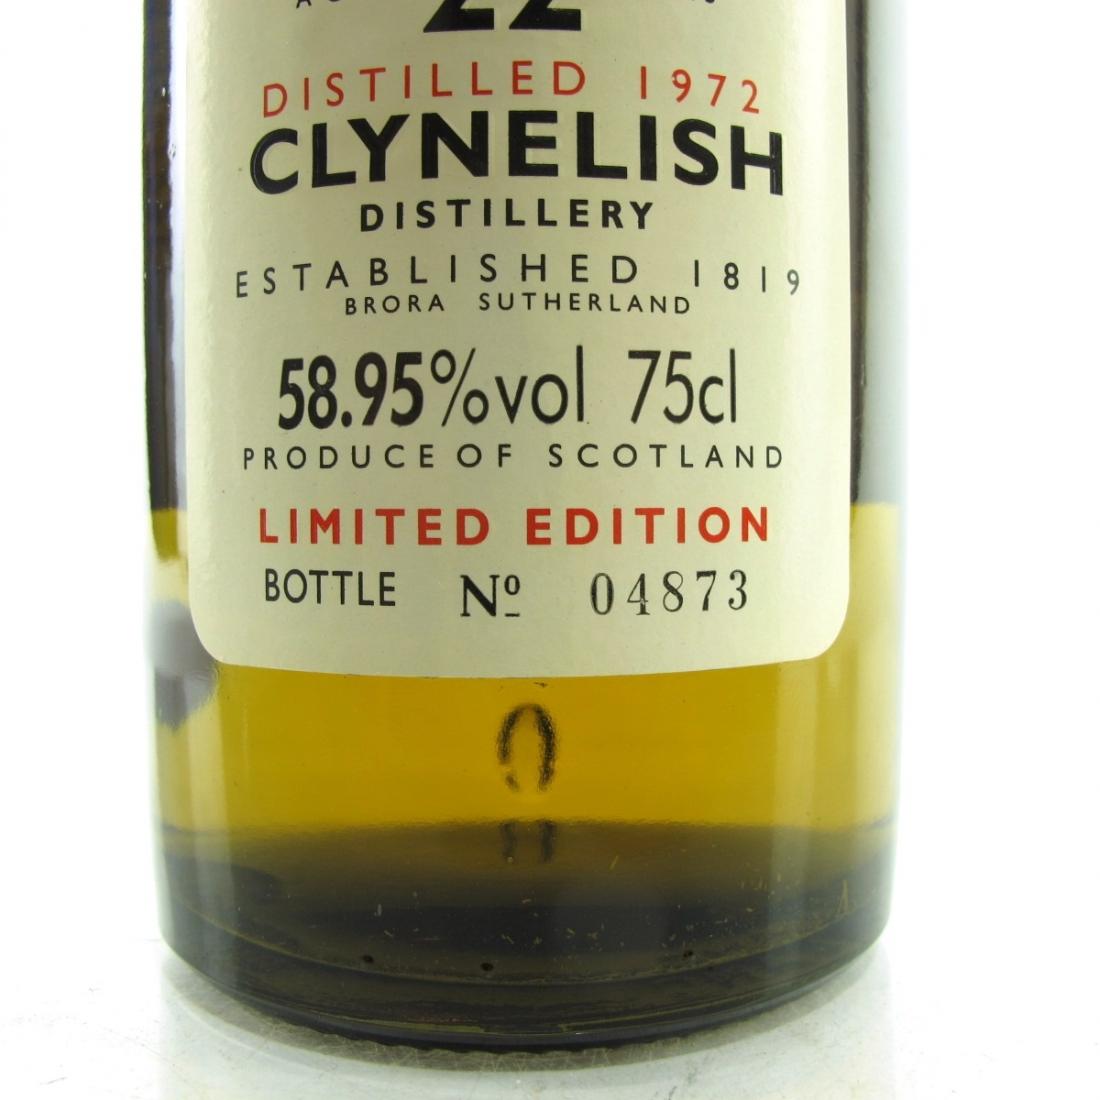 Clynelish 1972 Rare Malt 22 Year Old 75cl / 58.95%